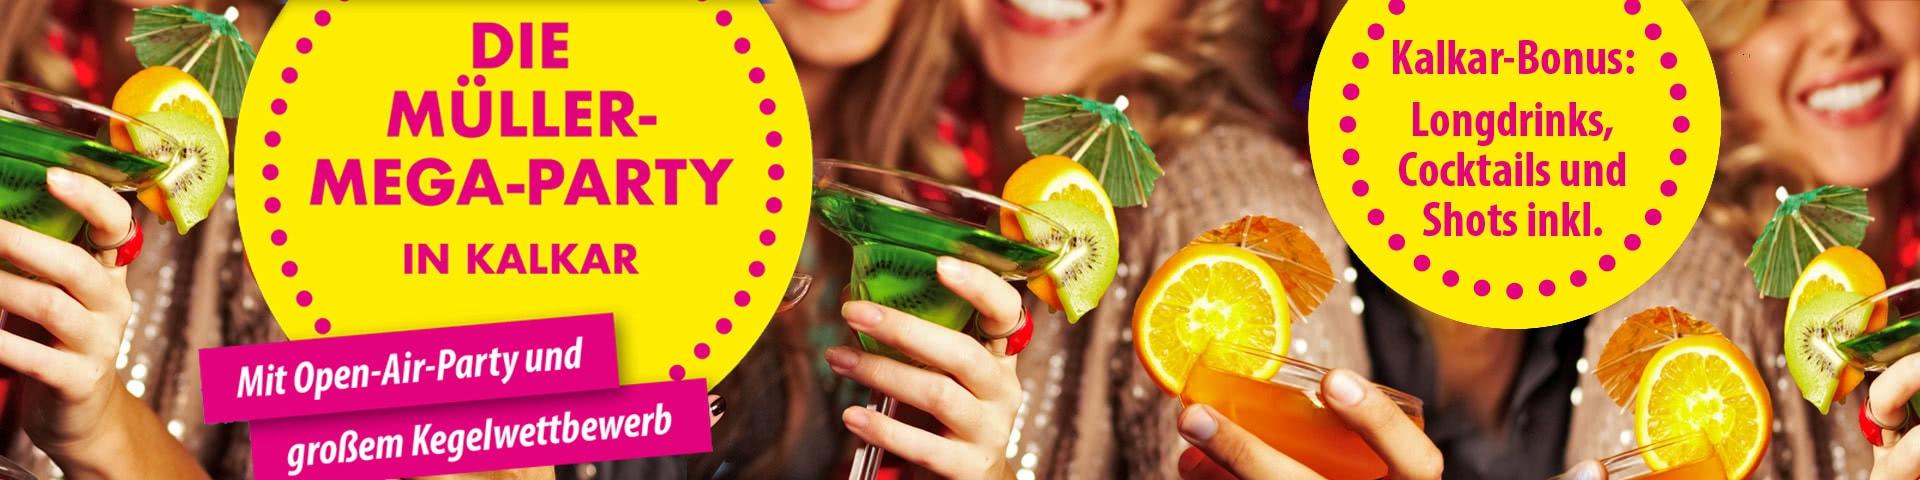 Die Müller-Mega-Party in Kalkar mit Getränke-Bonus